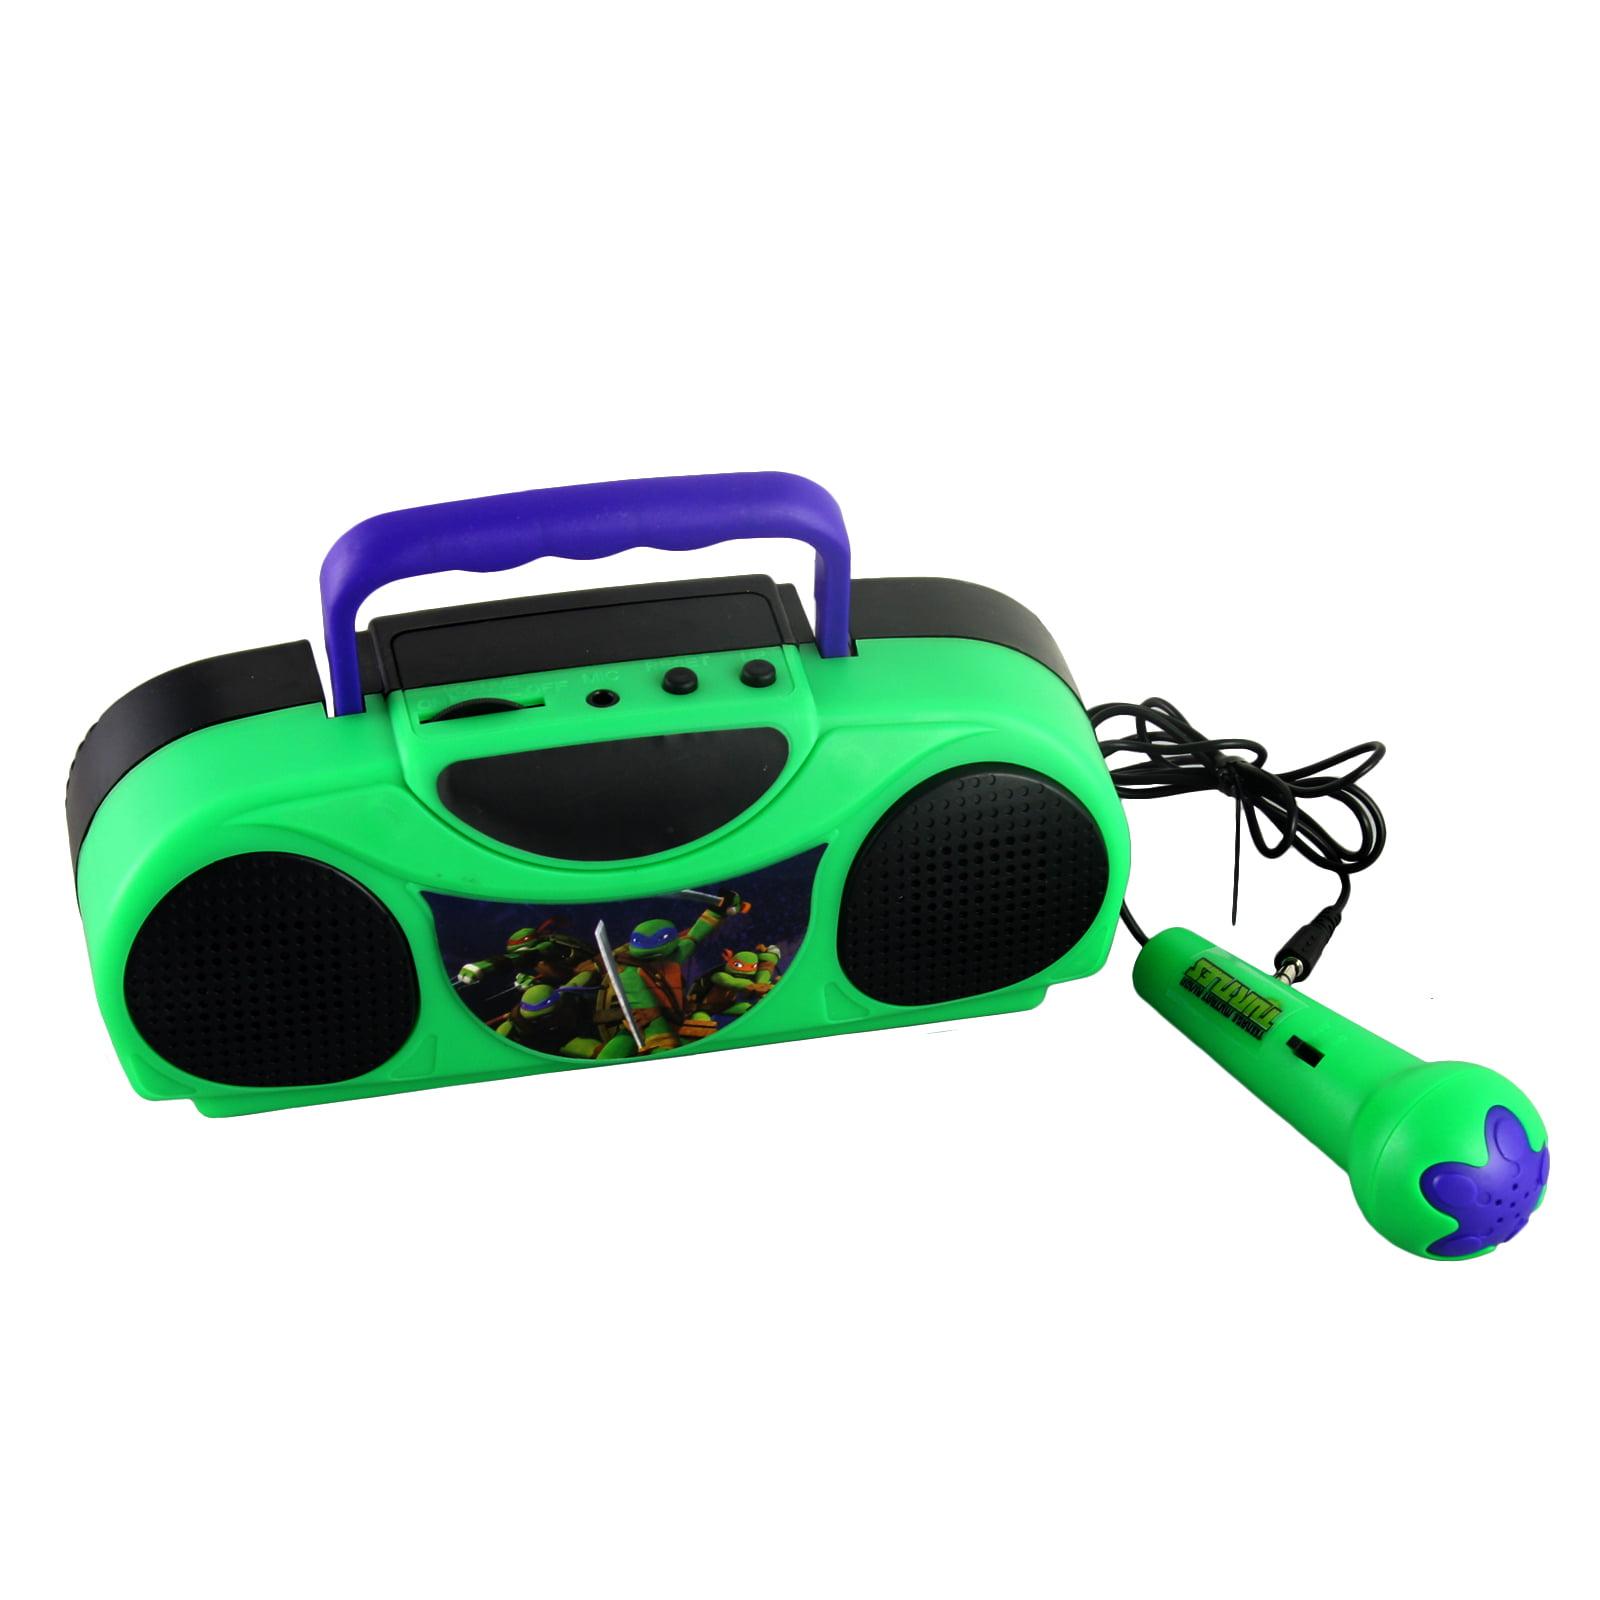 Teenage Mutant Ninja Turtles Portable Radio Karaoke Kit With Microphone by Sakar